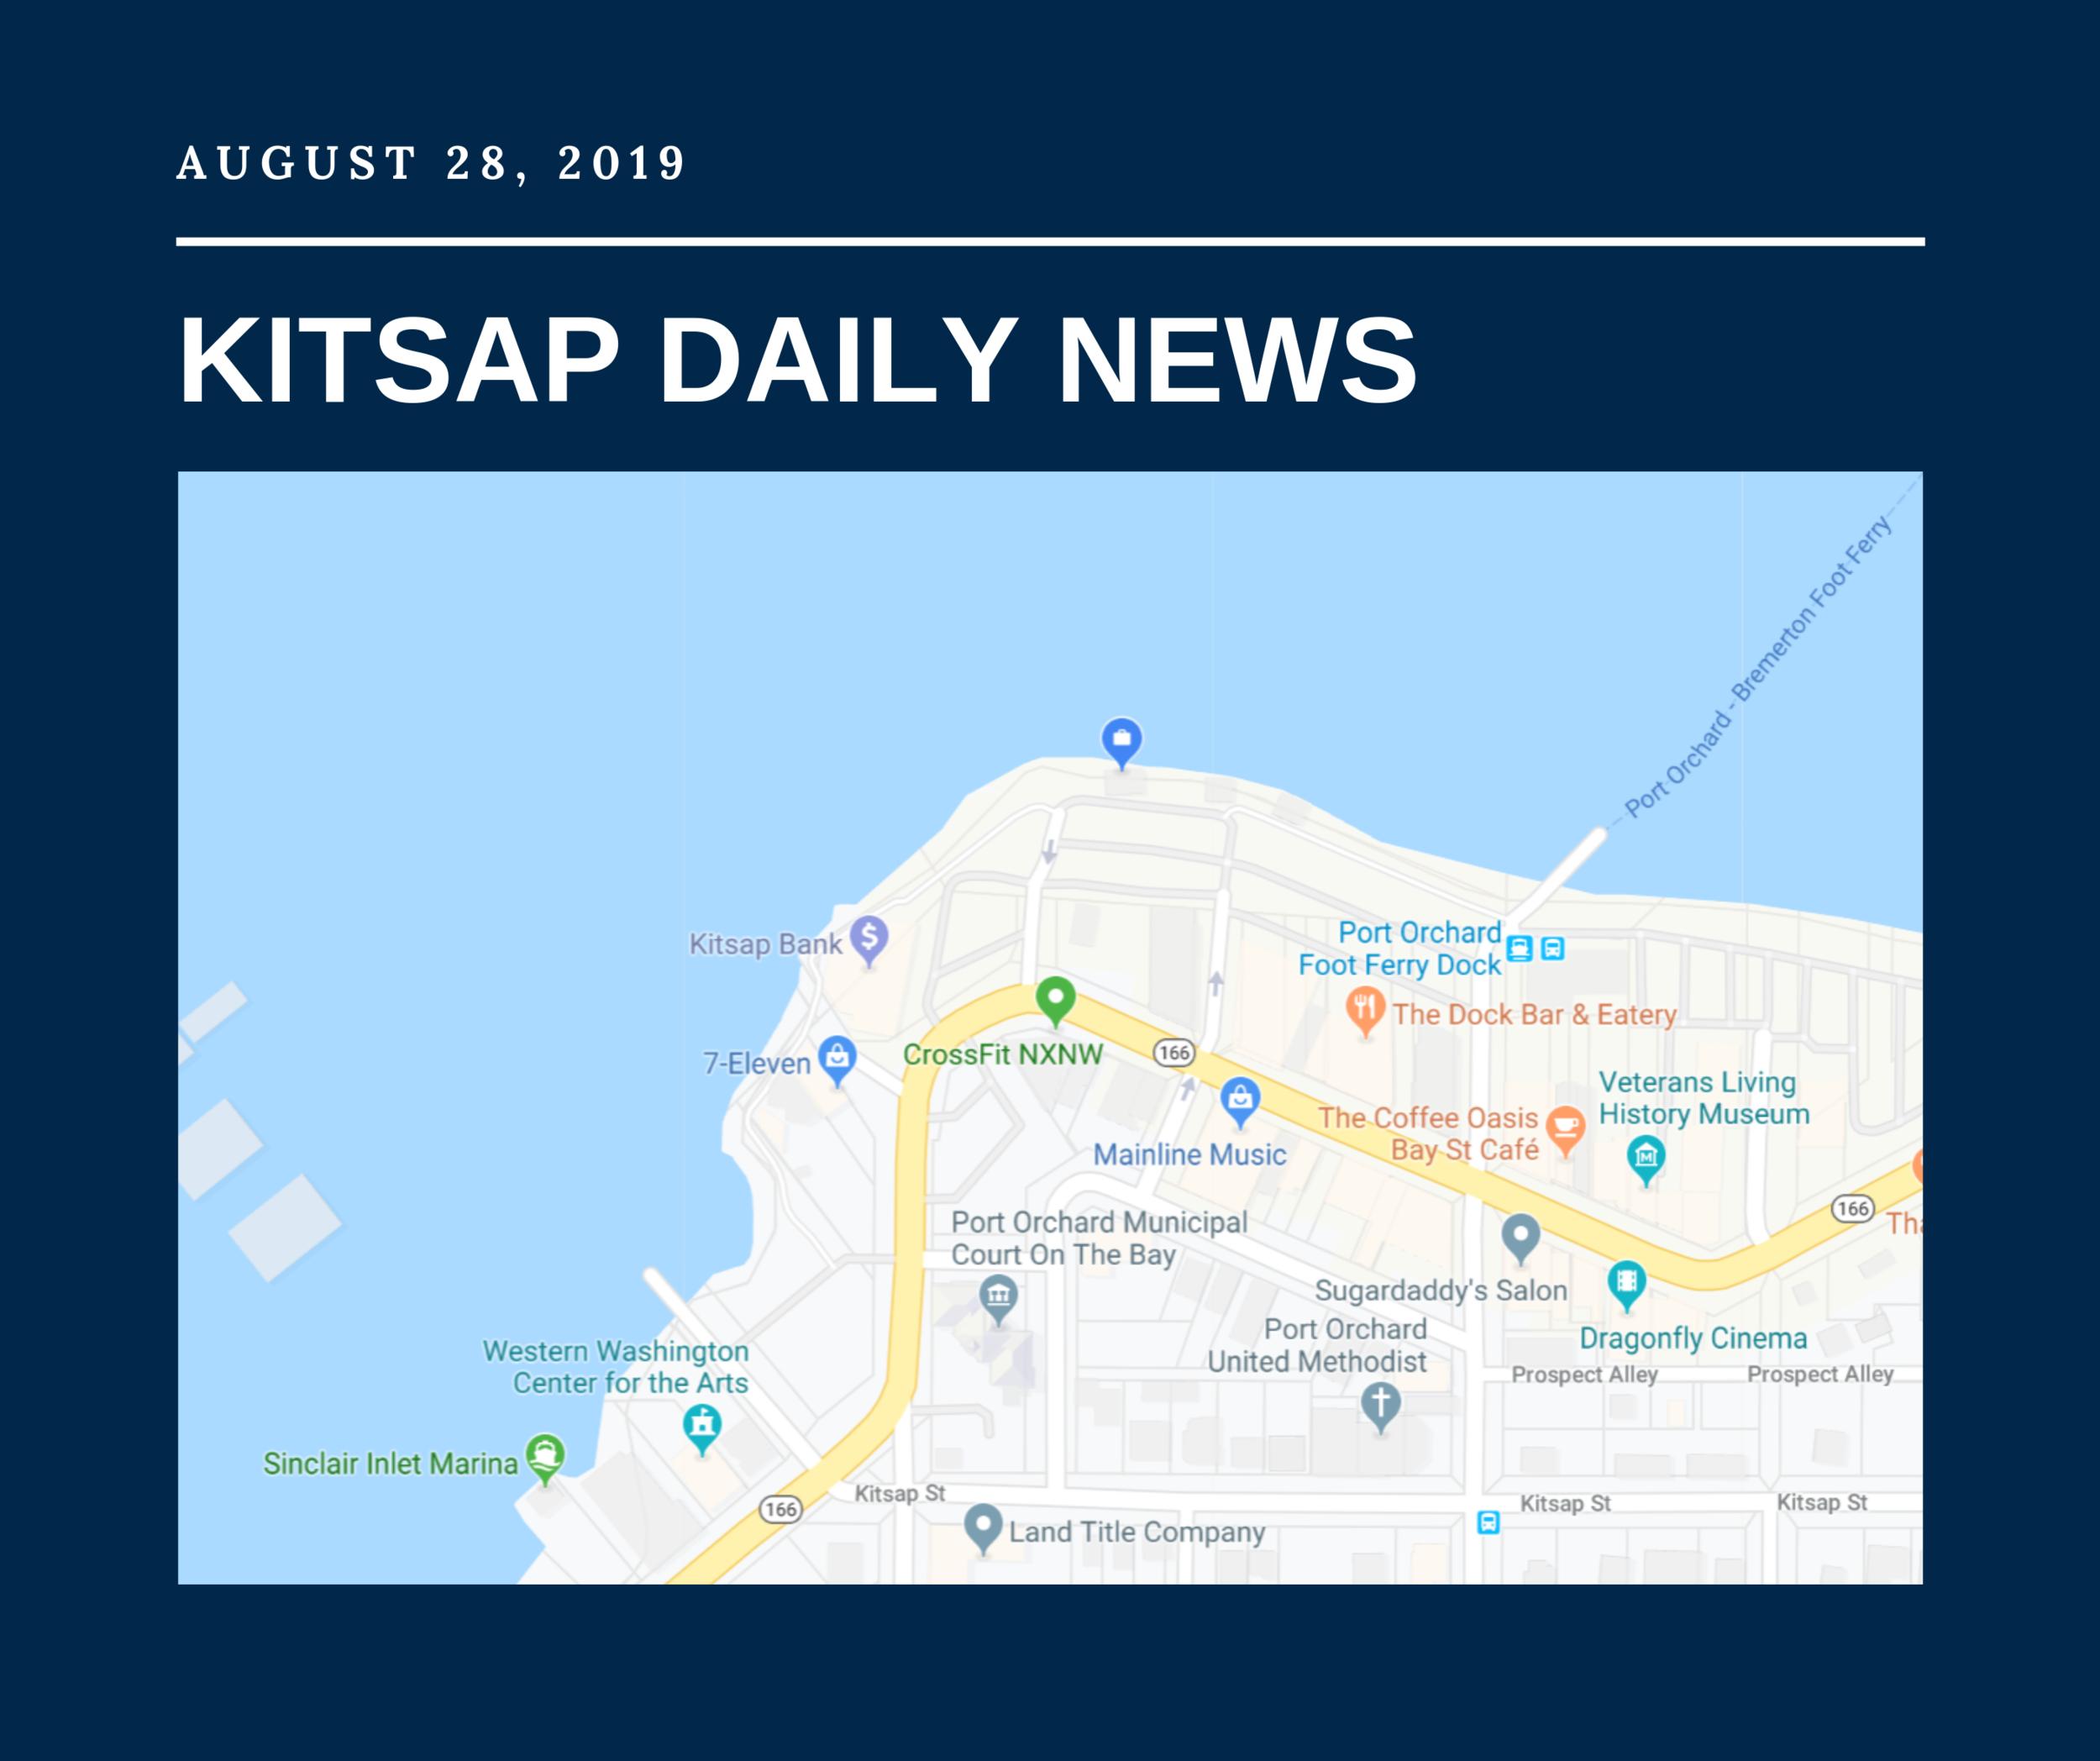 kitsap daily news (1).png